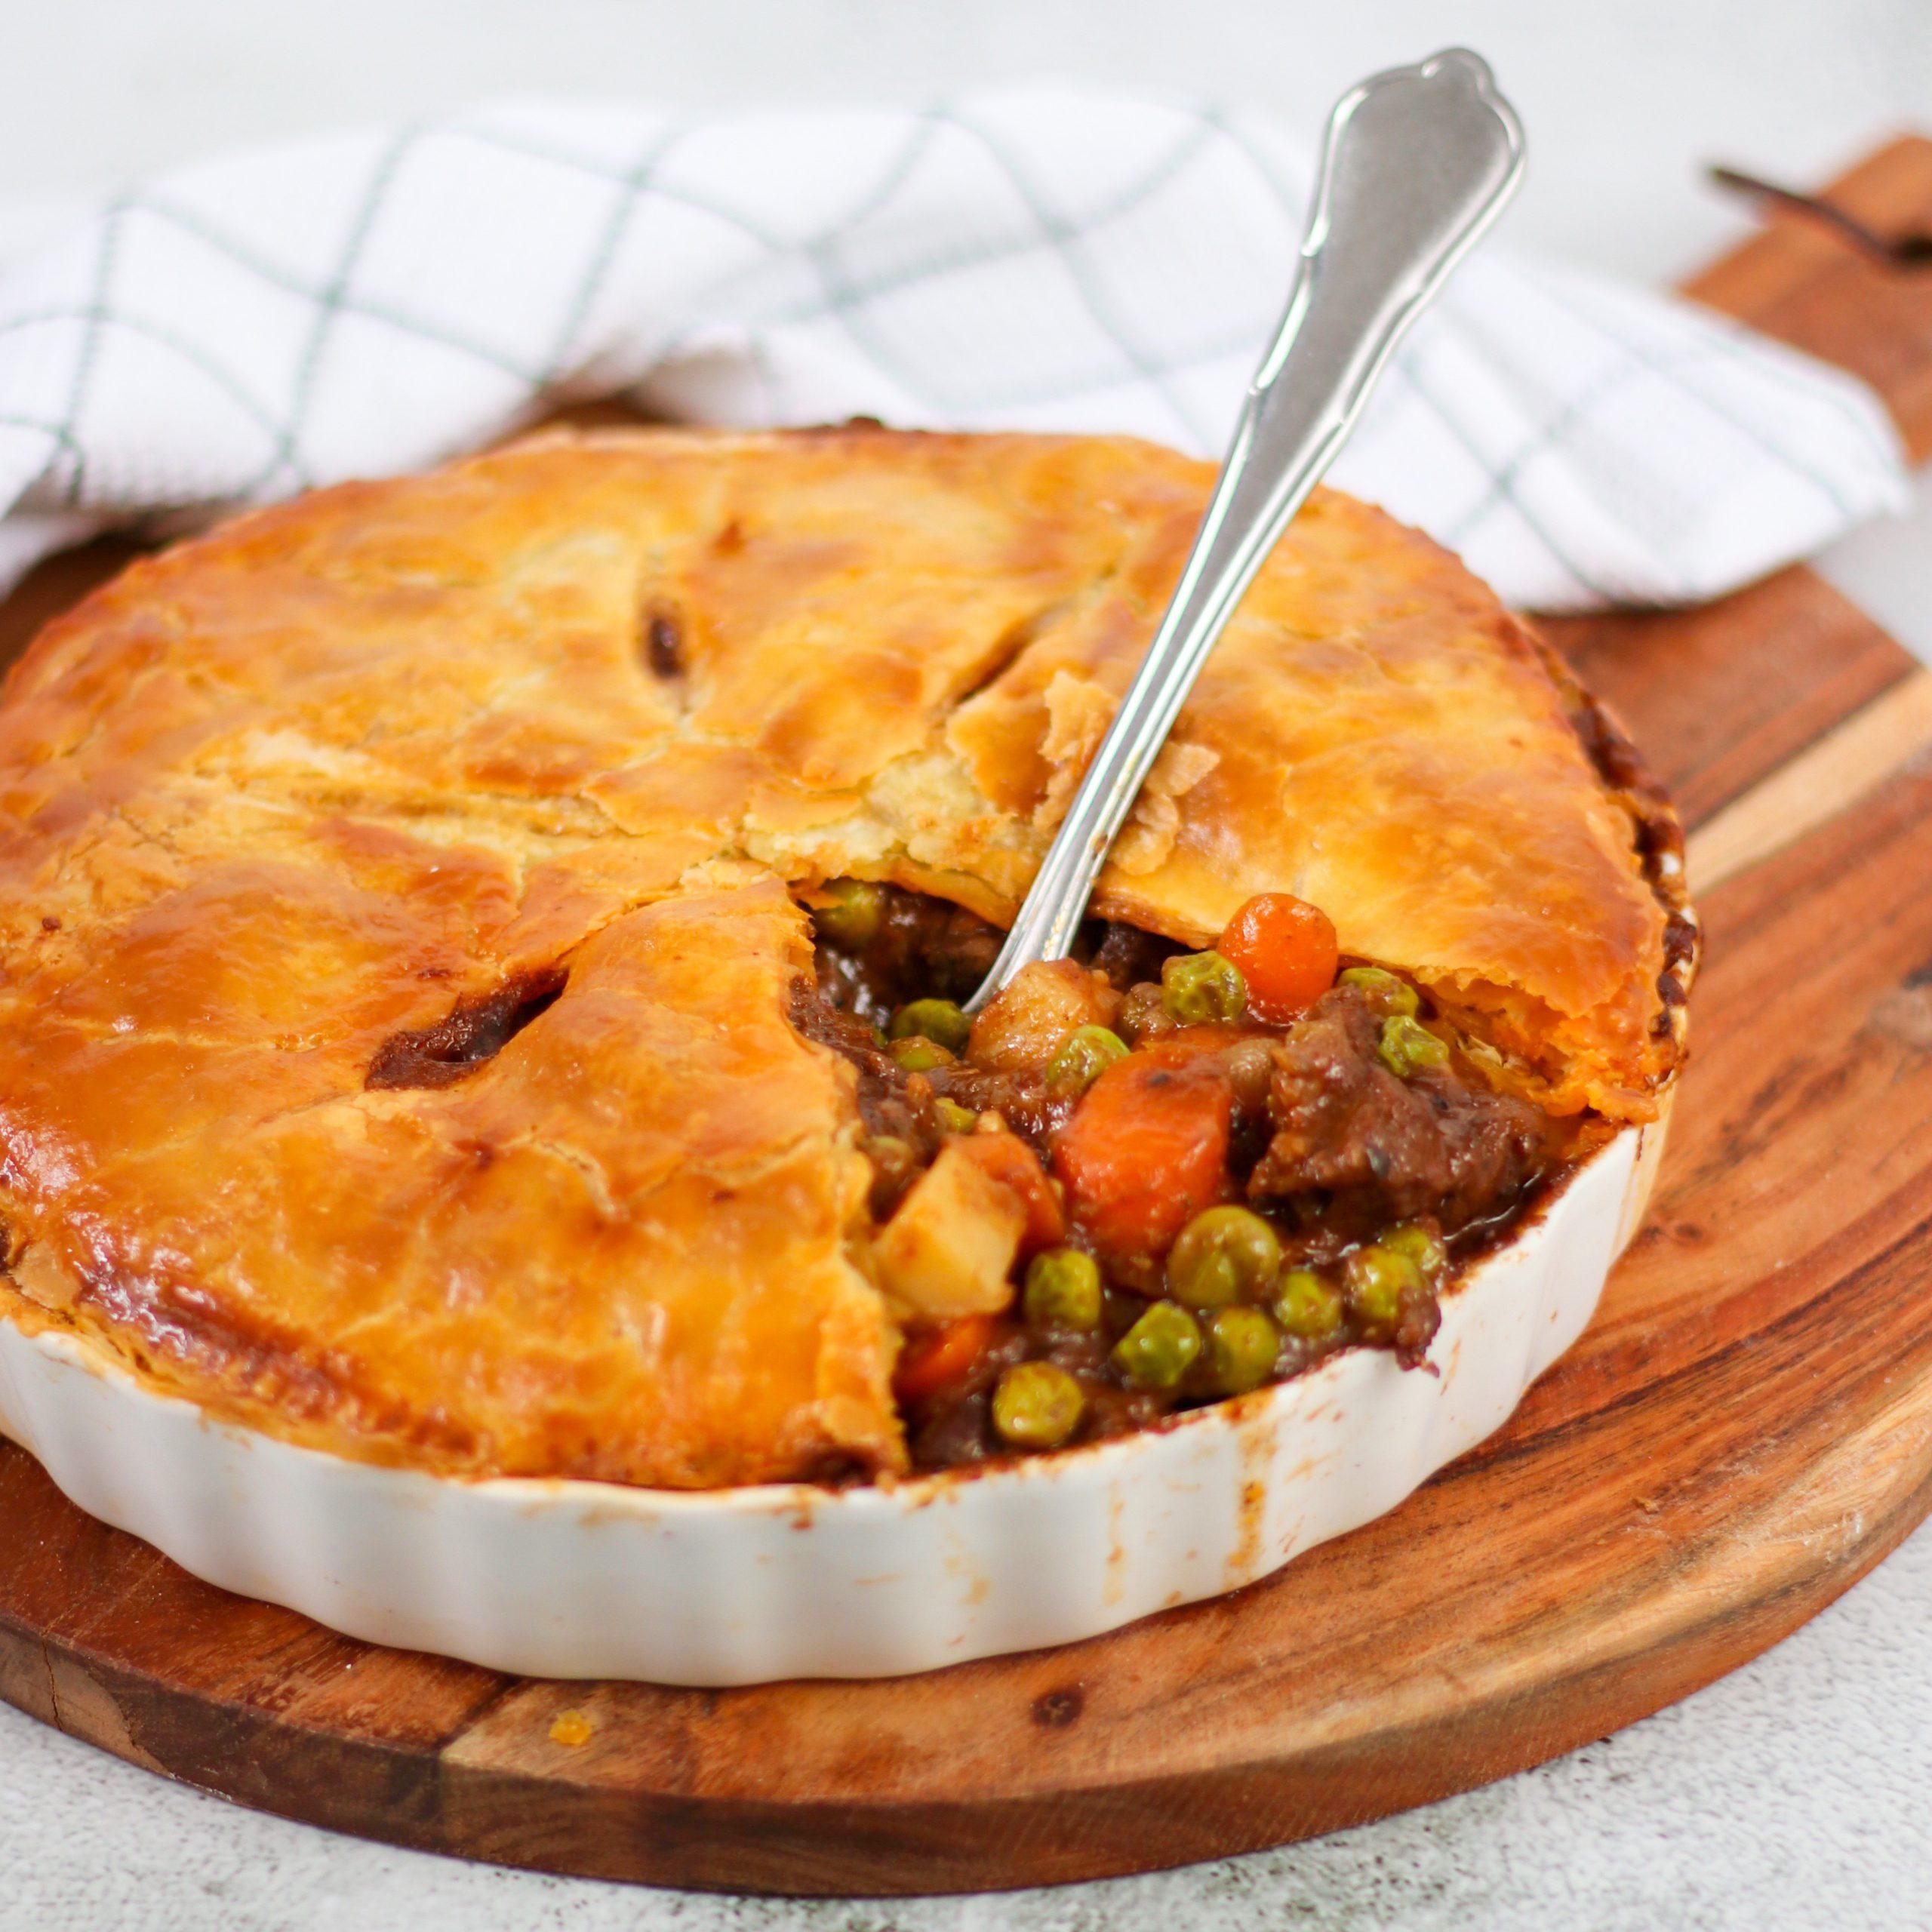 Pie met rundvlees uit de slowcooker of braadpan